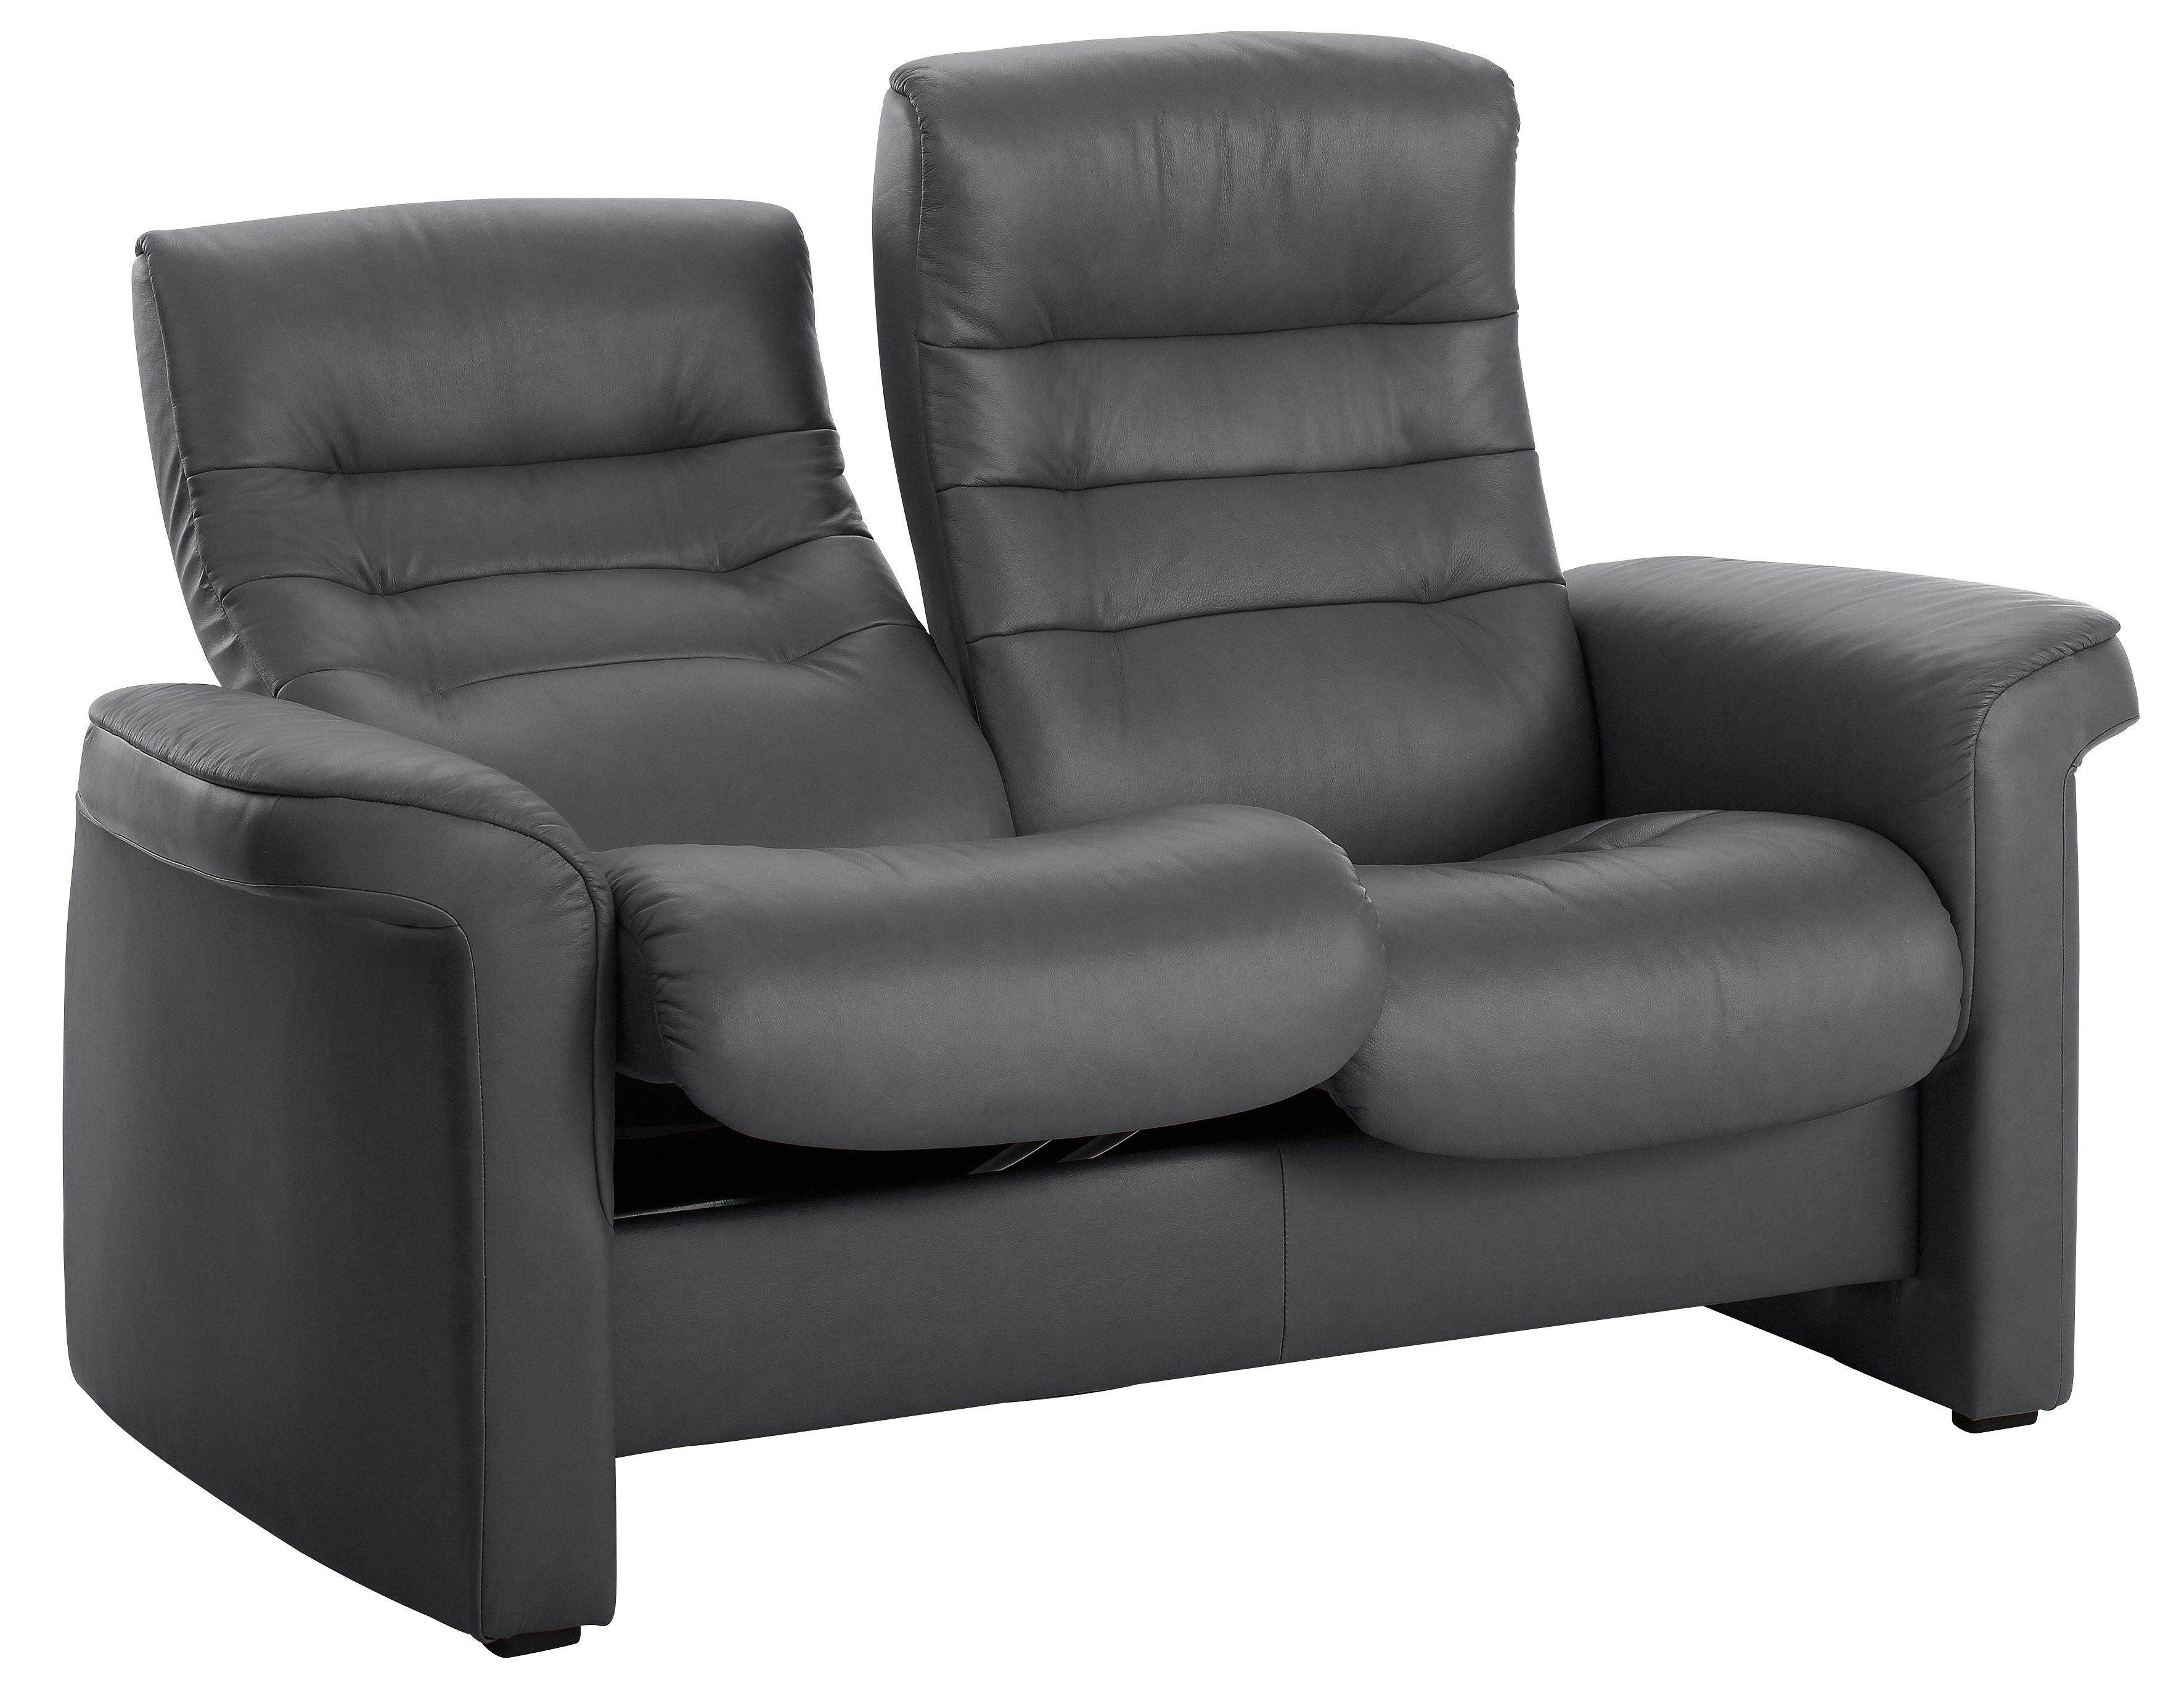 Stressless® 2-Sitzer Sofa High »Sapphire«, in Kinosessel-Optik